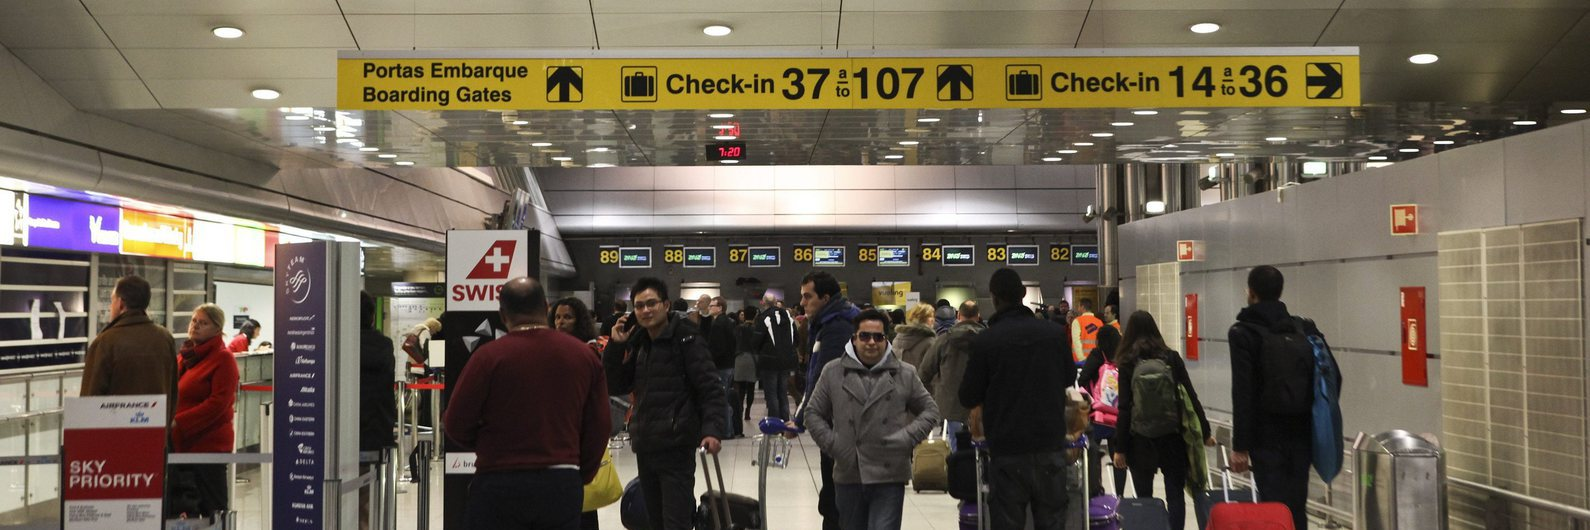 Falha protocolar leva a alerta de segurança no Aeroporto de Lisboa